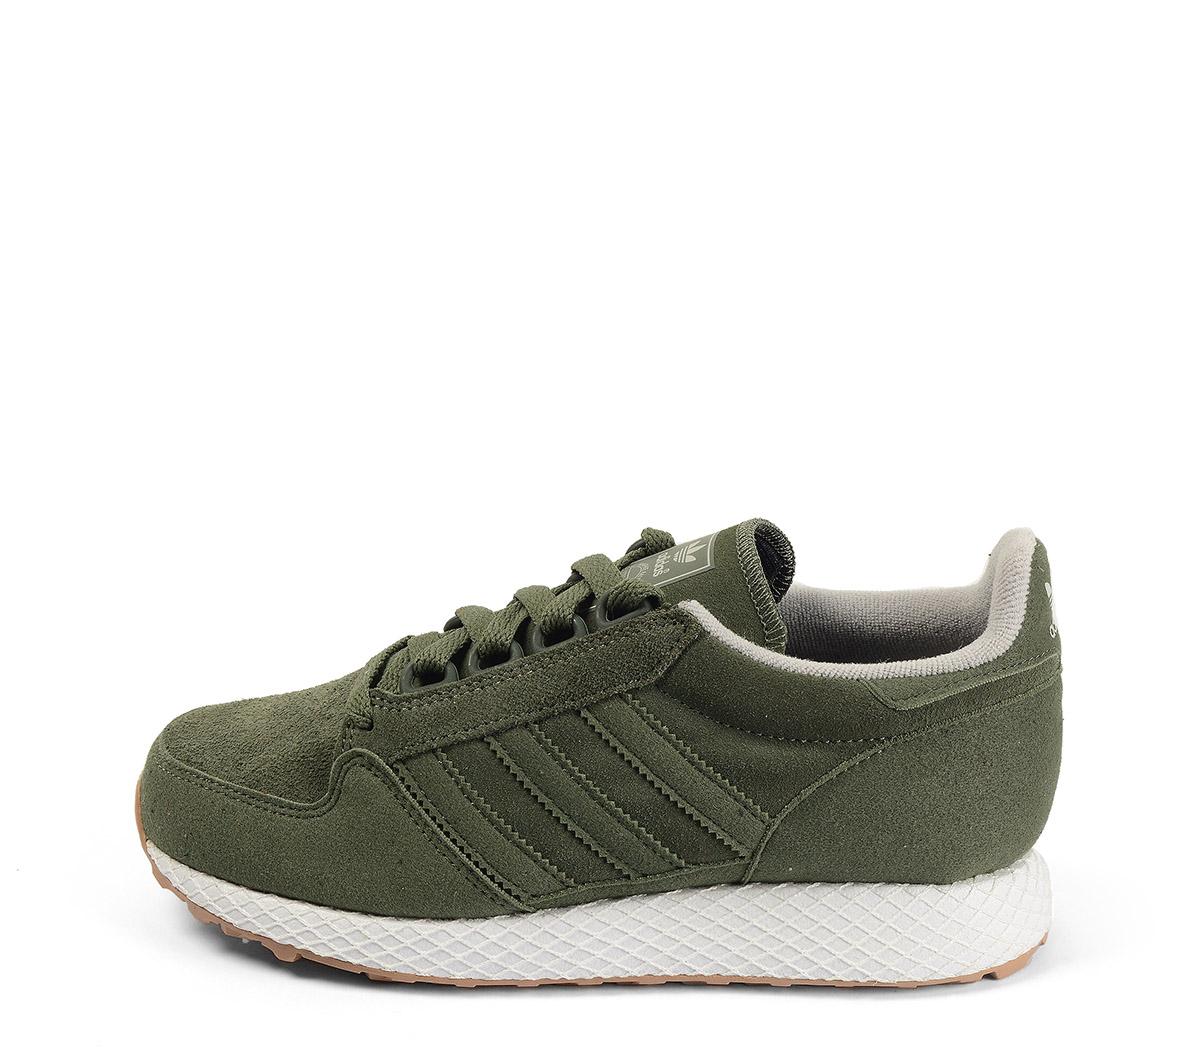 Ref. 4177 Adidas Forest Grove J serraje kaki. Cordones al tono. Suela blanca.